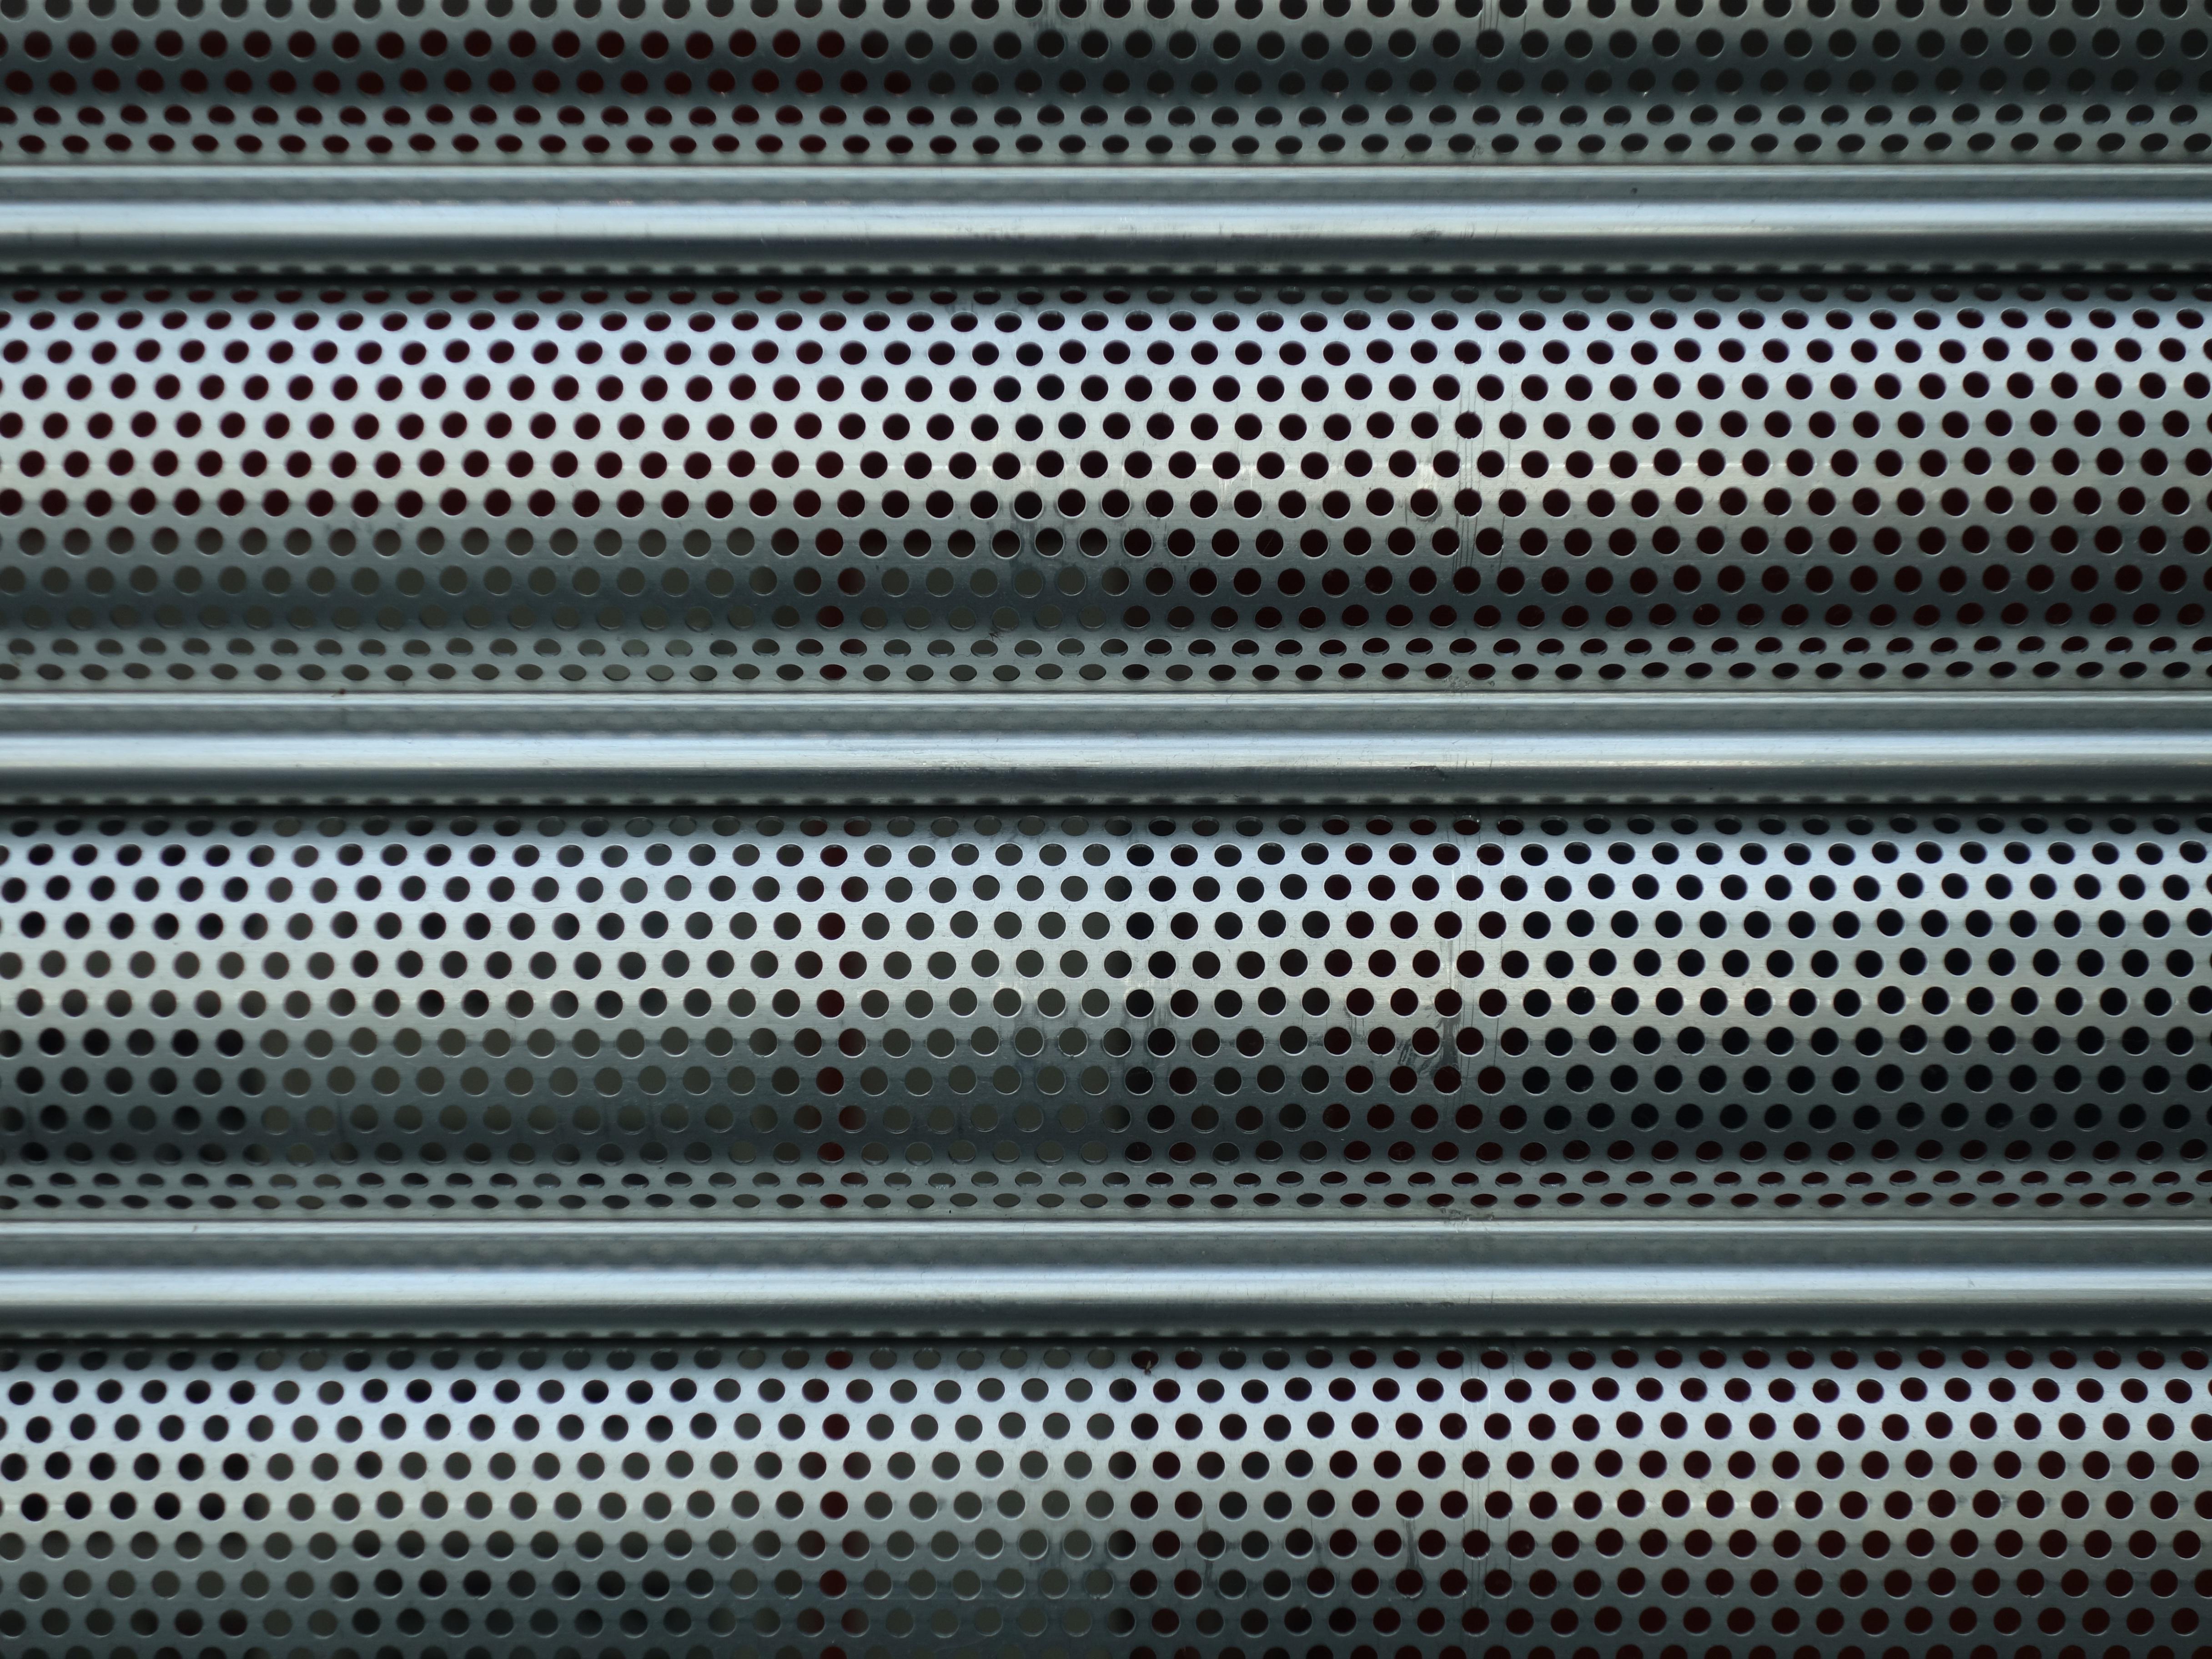 Fotos Gratis Tecnolog 237 A Textura Patr 243 N L 237 Nea